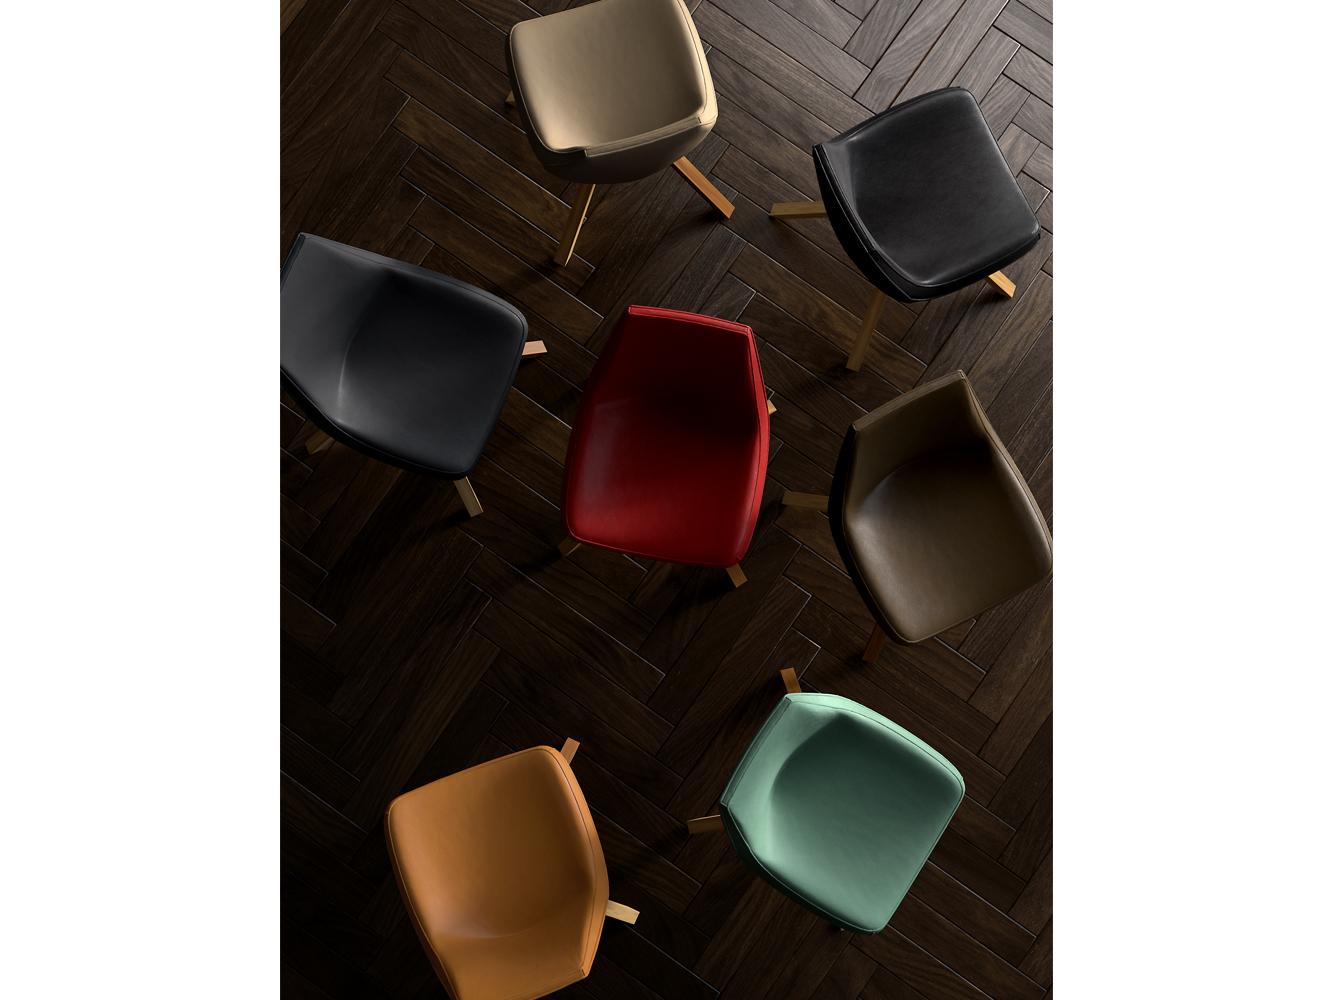 pix-us-cg-chairs